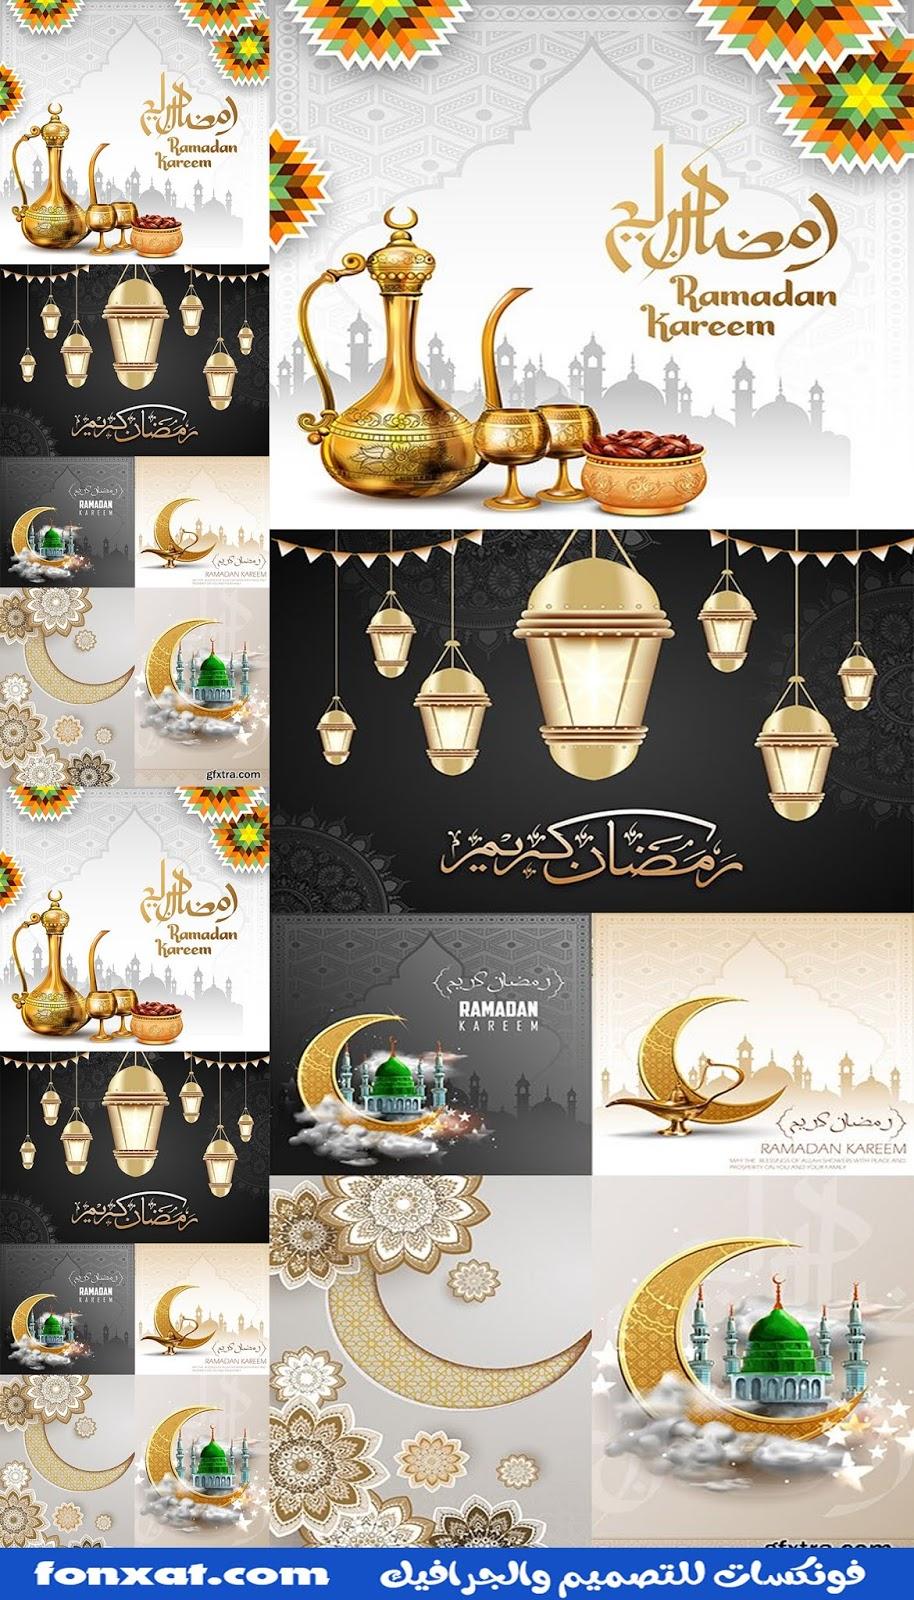 Ramadan Designs 2020 collection is very beautiful and harmonious